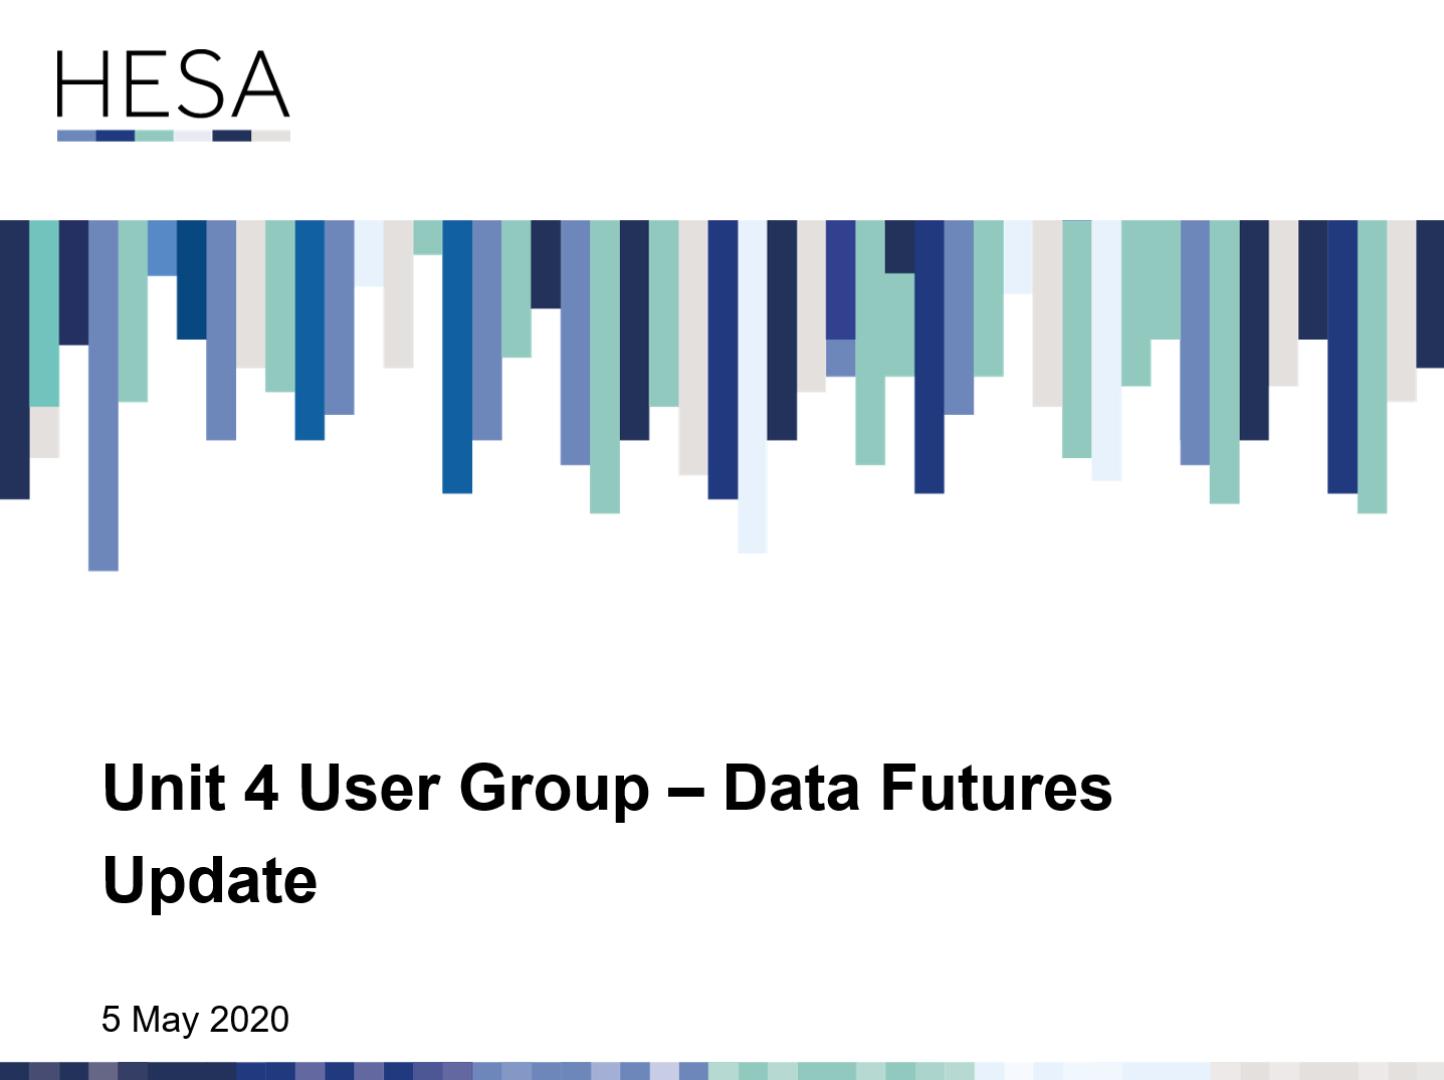 Data Futures Unit4 presentation